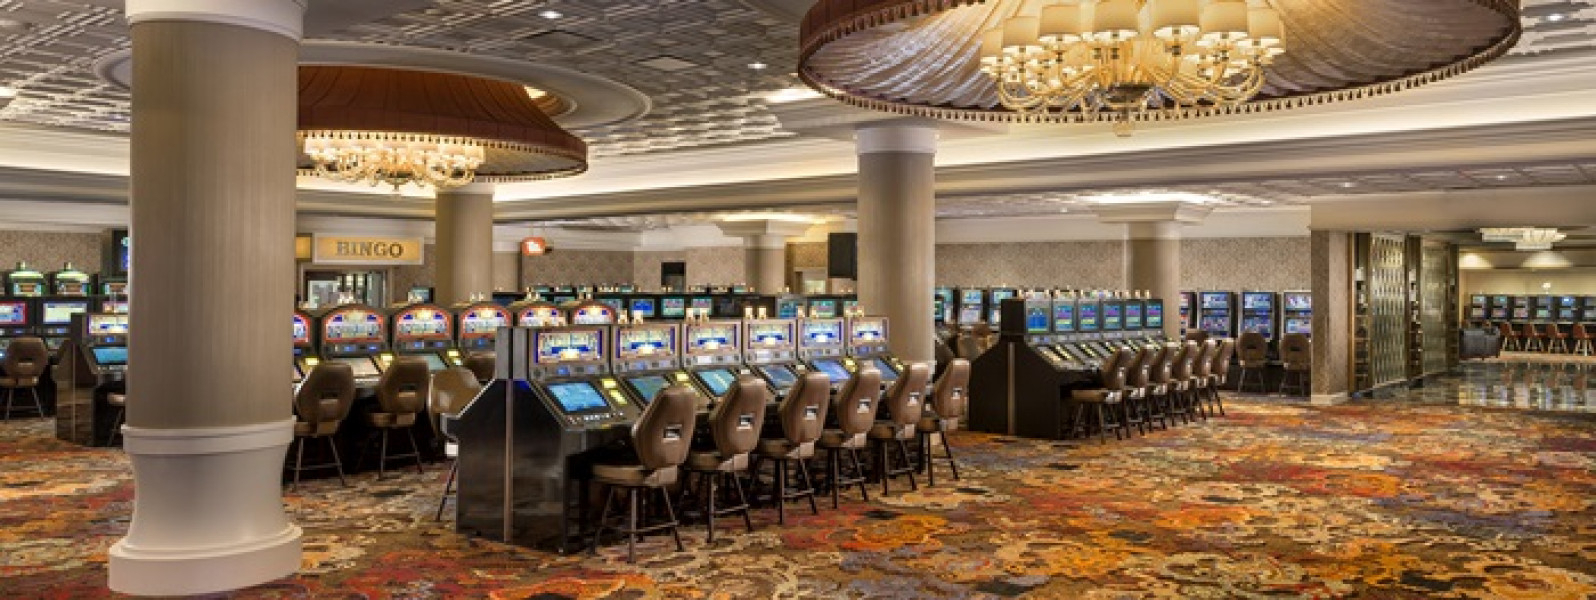 Turning Stone Resort & Casino intended for Turning Stone Bingo Games For Oct.24